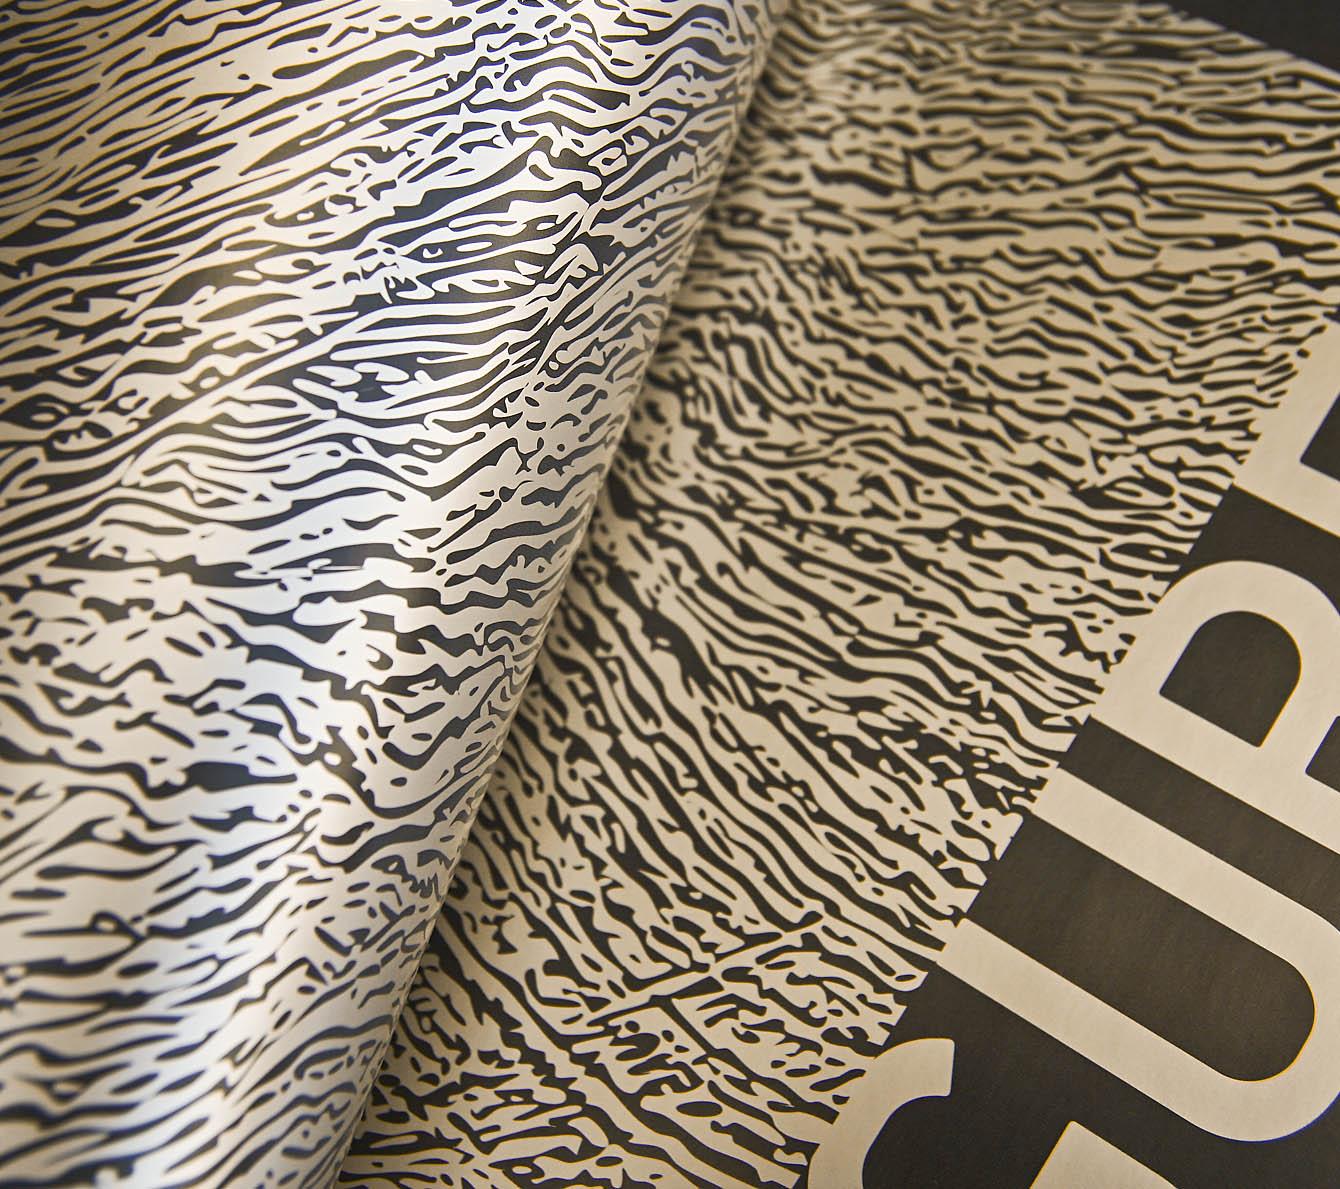 Artwork SPE 2008 3 - 1340px wide